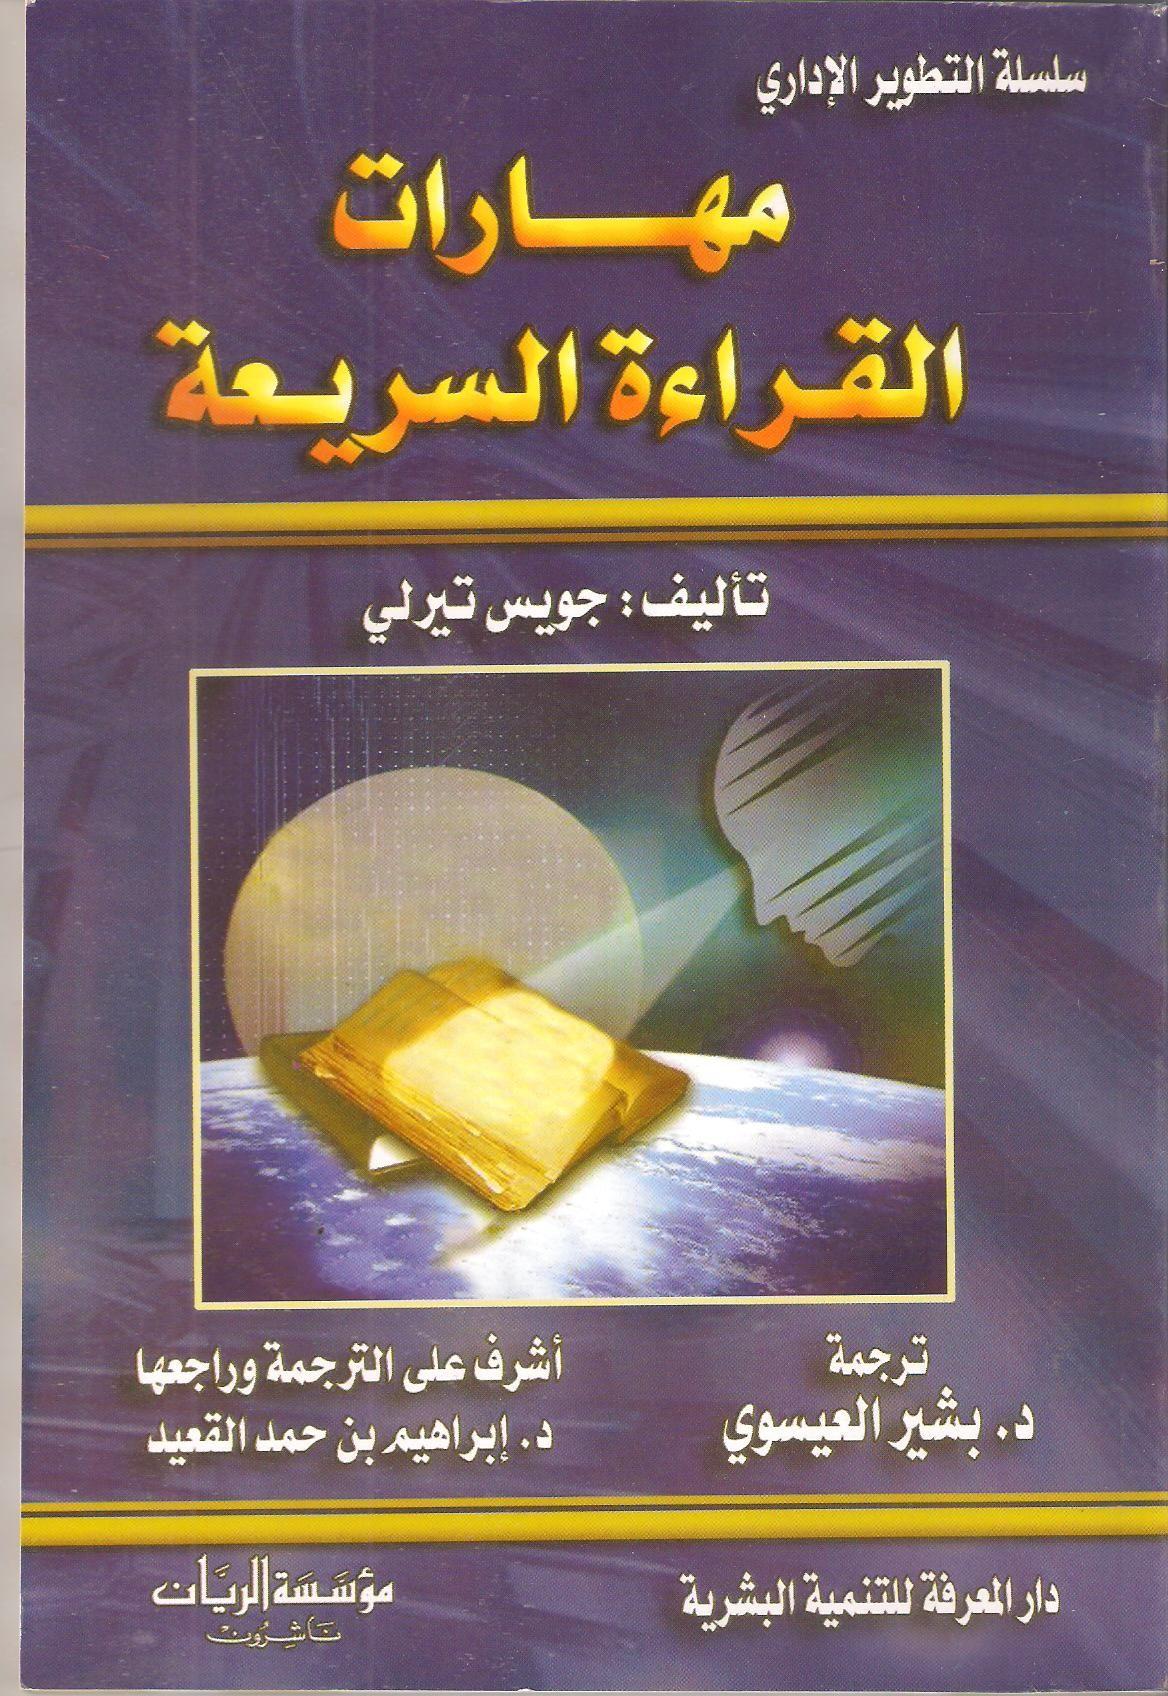 القراءة السريعة Ebooks Free Books Arabic Books Book Club Books